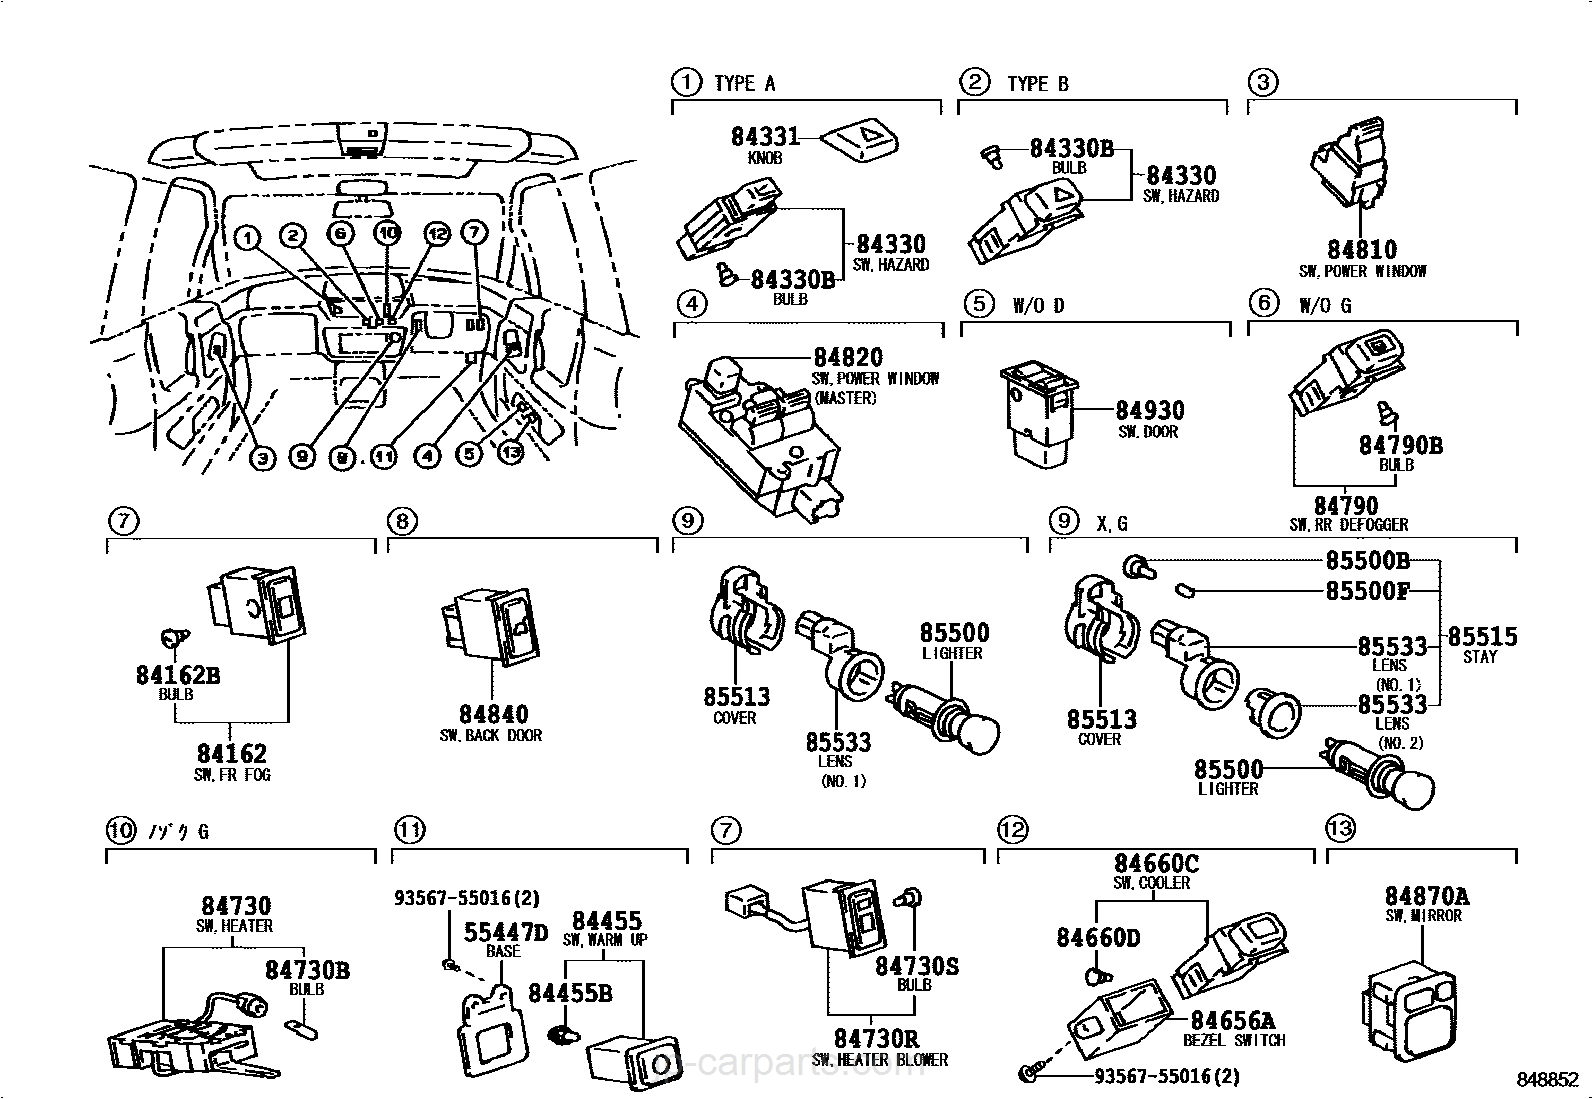 Toyota Emina Fuse Box Reinvent Your Wiring Diagram Previa Experts Of U2022 Rh Evilcloud Co Uk 1997 Van